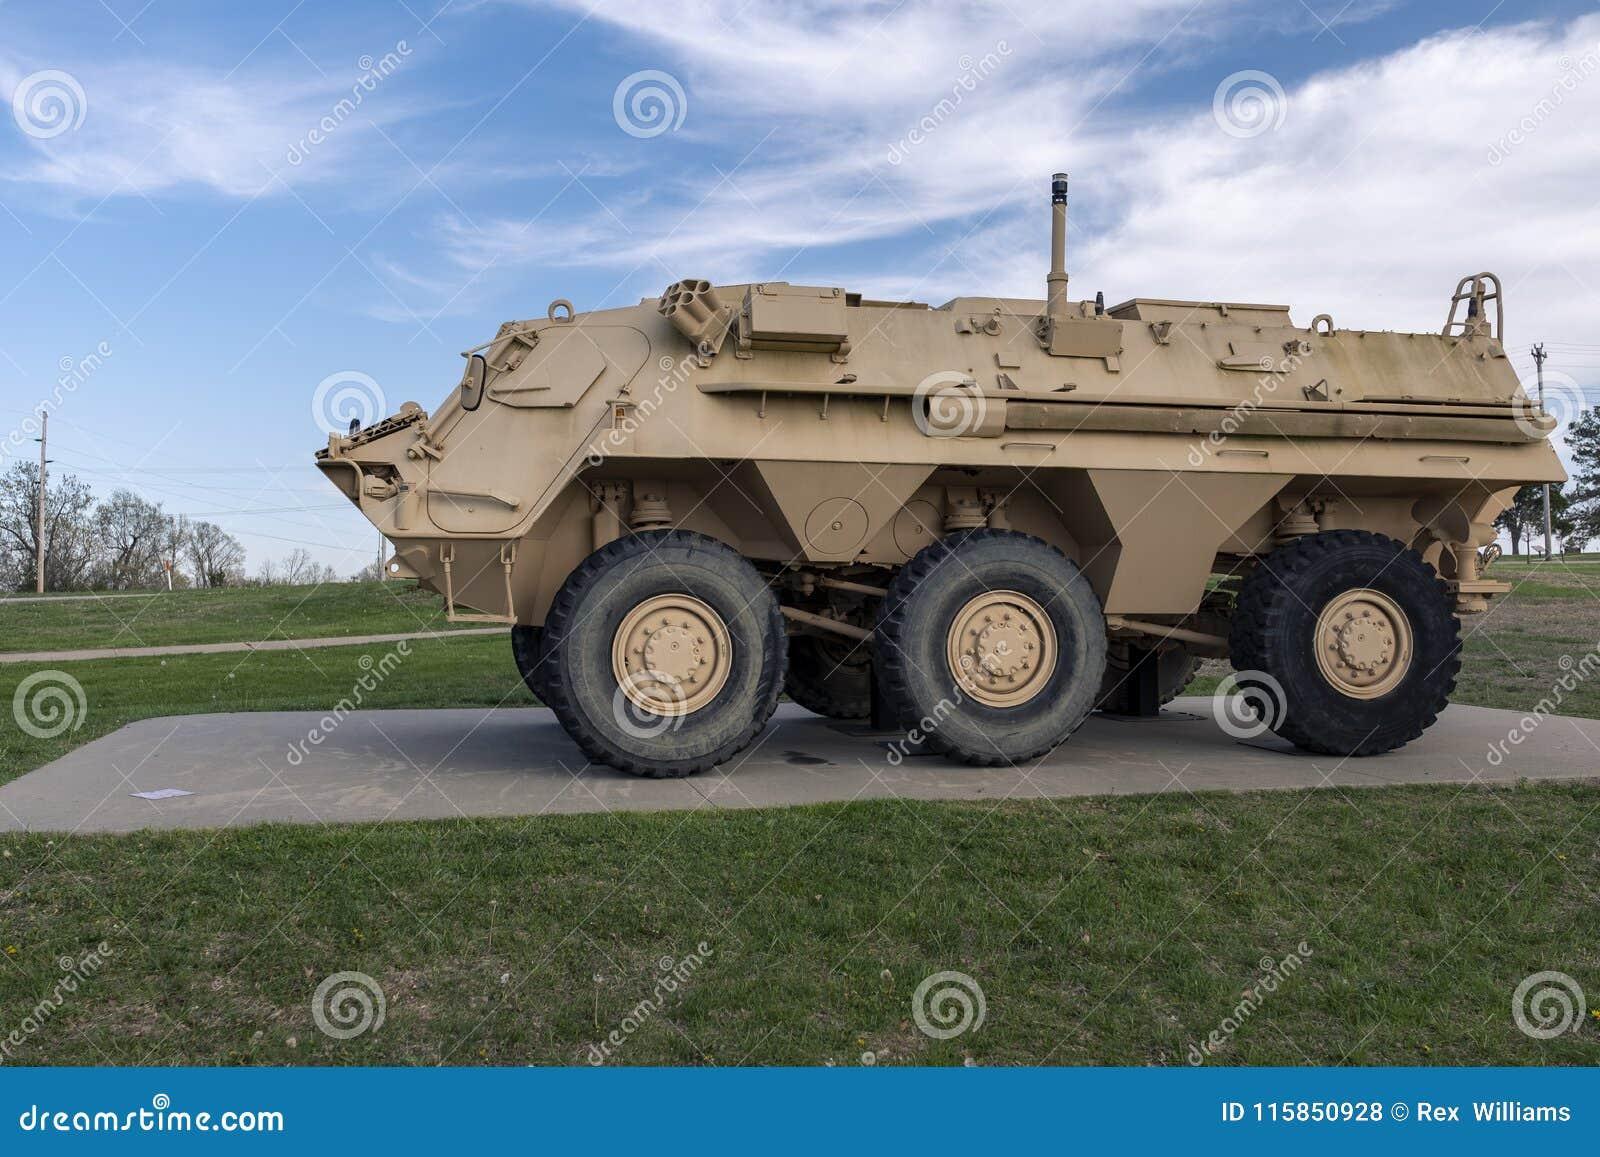 FORTU LEONARD drewno, MO-APRIL 29, 2018: Pojazd Wojskowy M93A1 FOX NBCRS